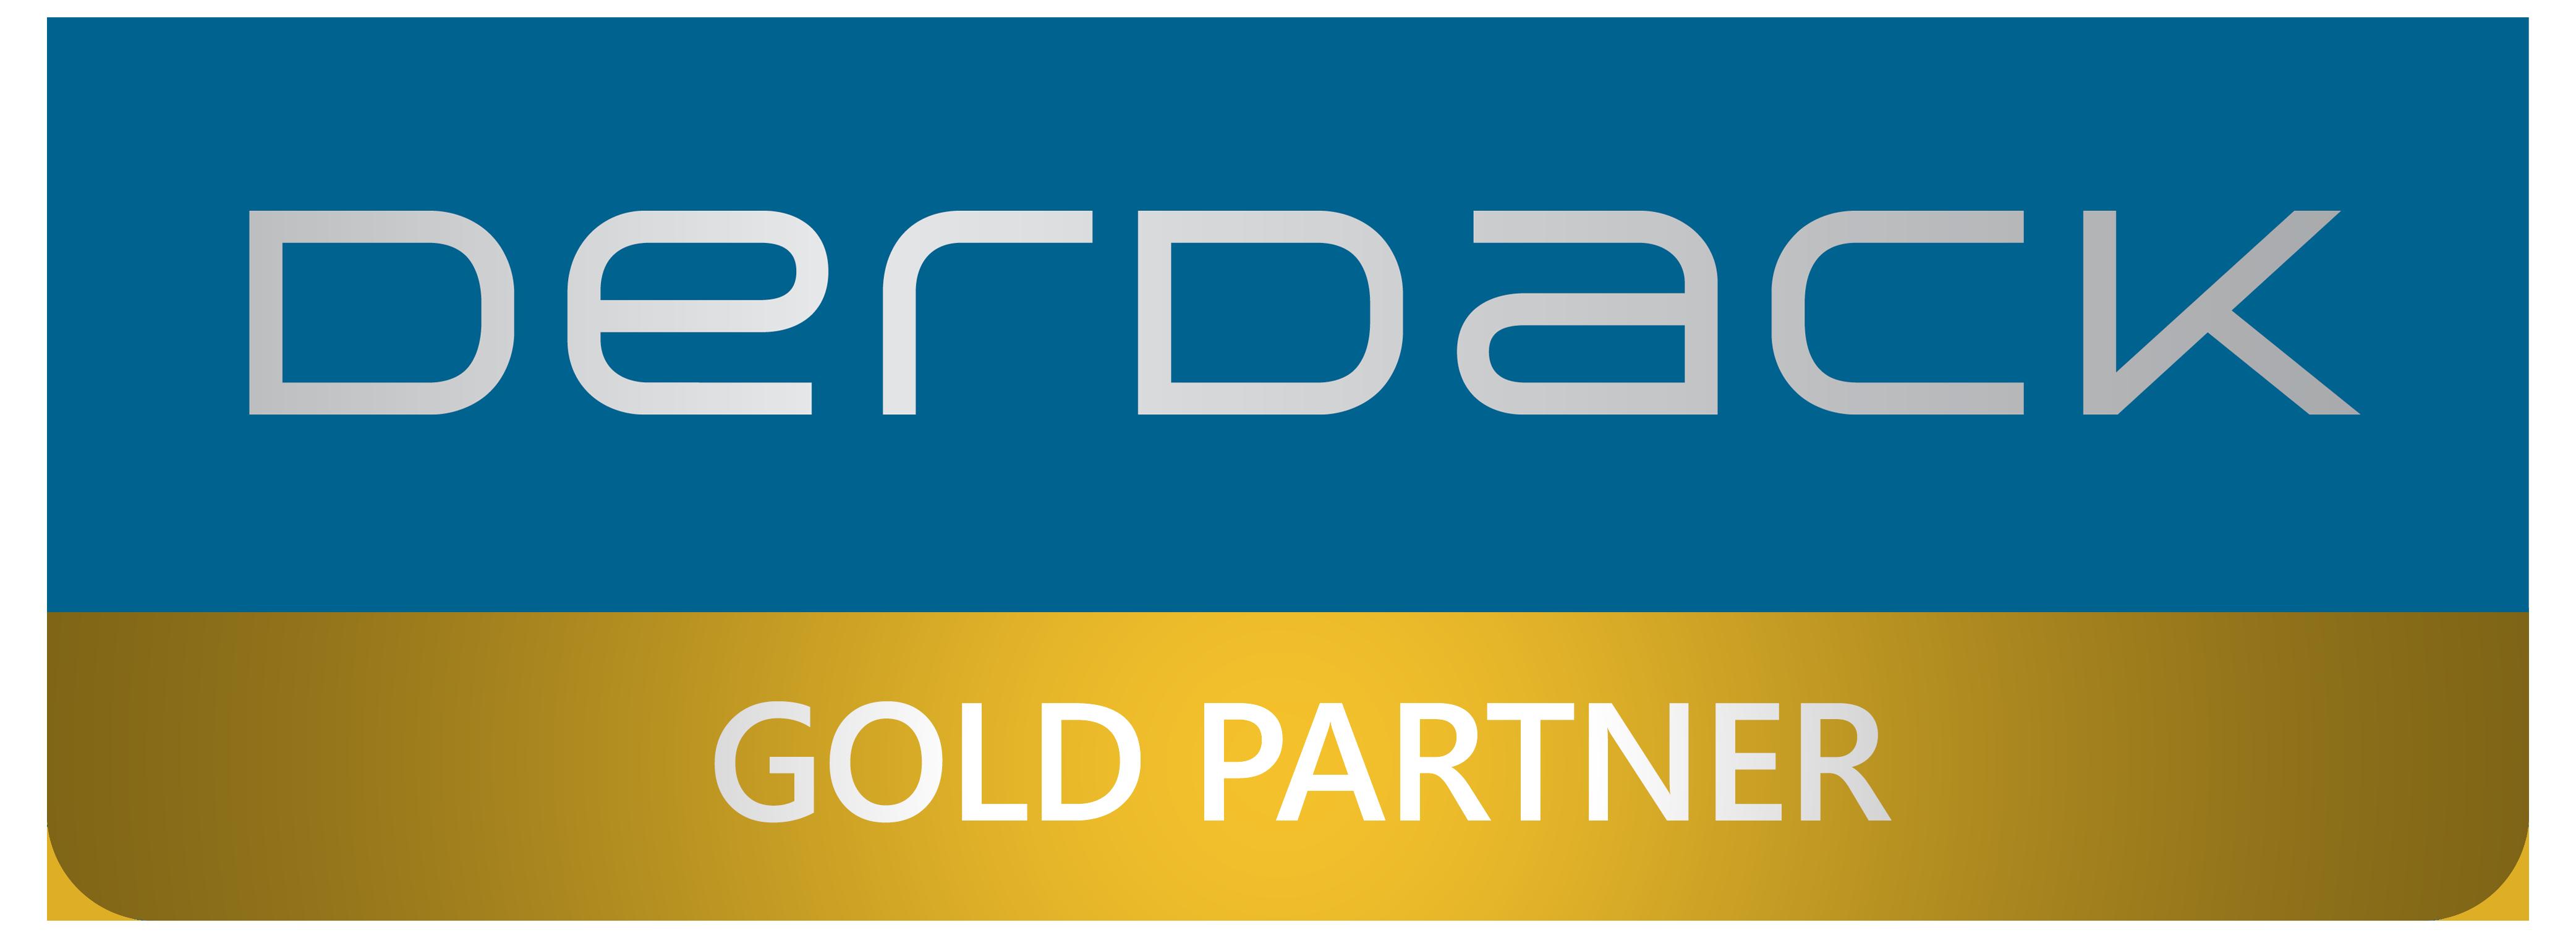 Partnerlogos_2021_gold_glossy